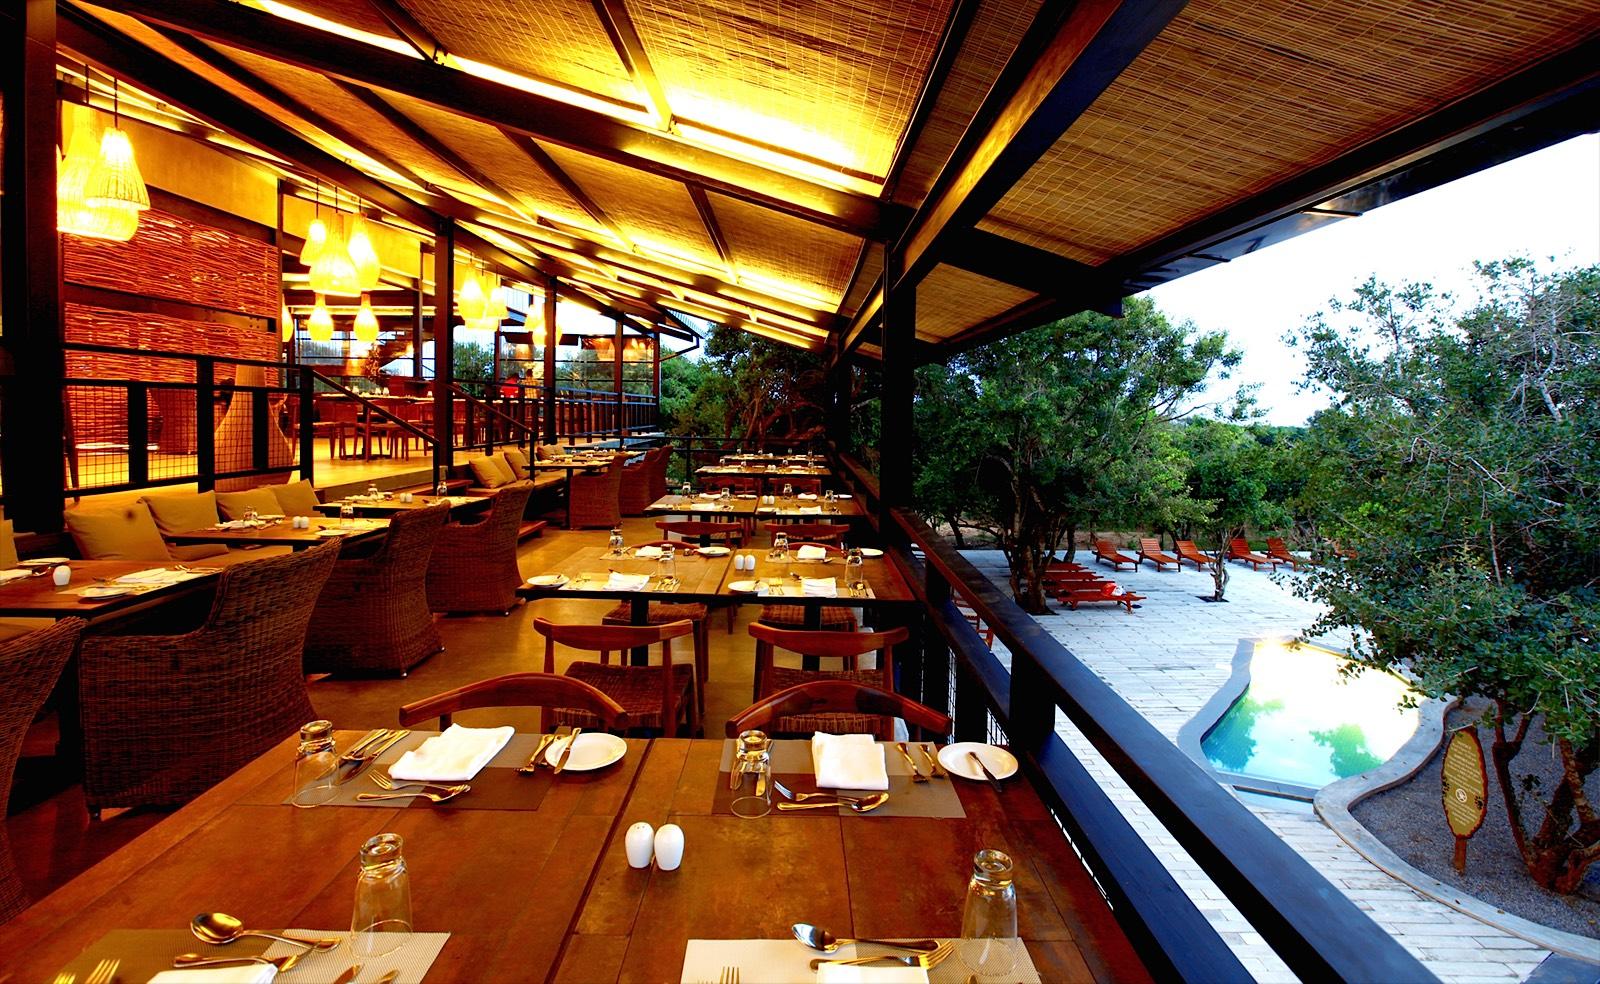 invite-to-paradise-holiday-honeymoon-sri-lanka-specialists-safari-lodge-cinnamon-wild-hotel-7.jpg